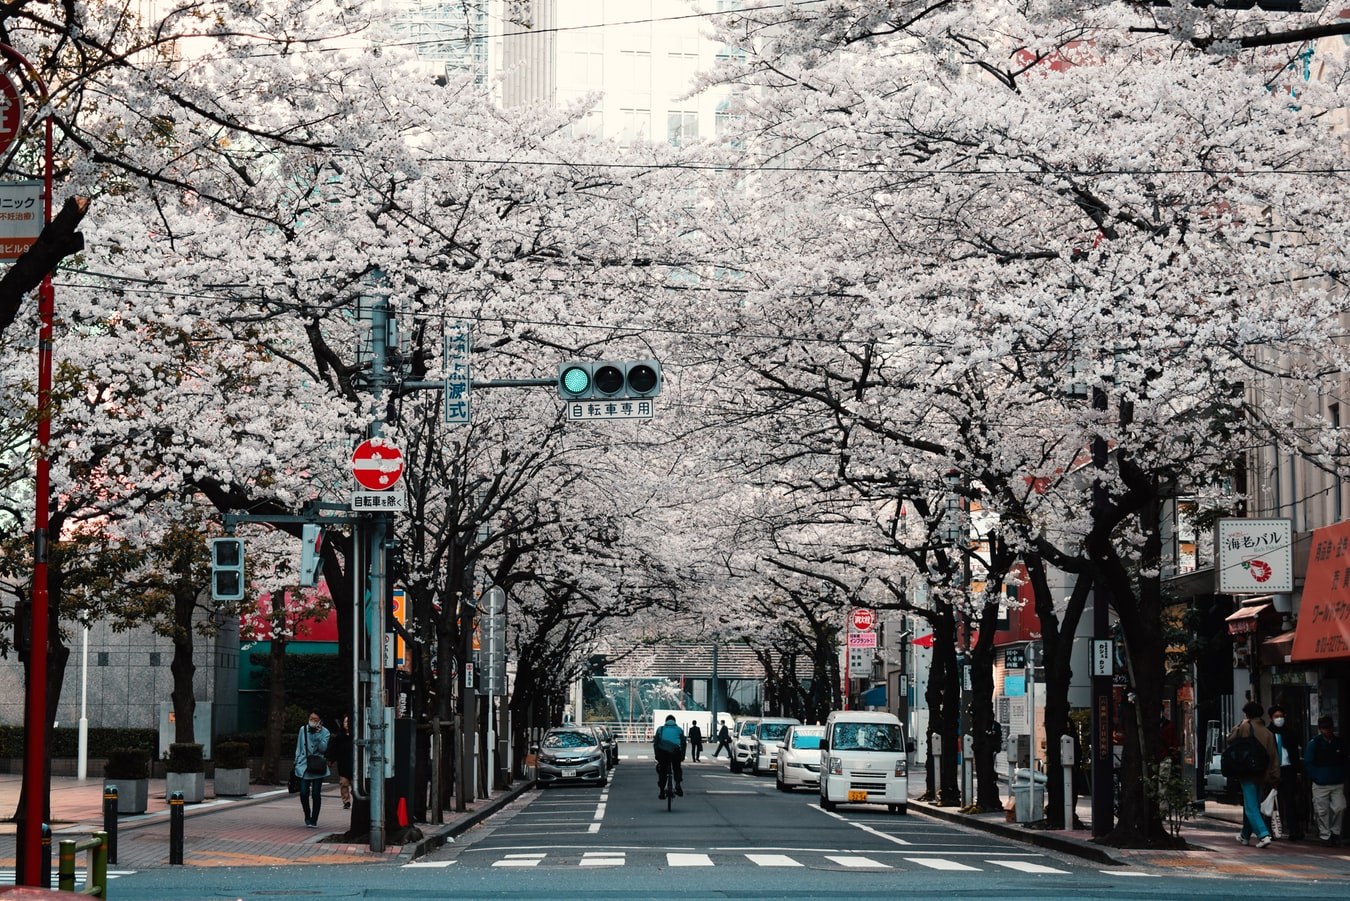 SAKURA EN JAPON: LO MEJOR DE LA PRIMAVERA